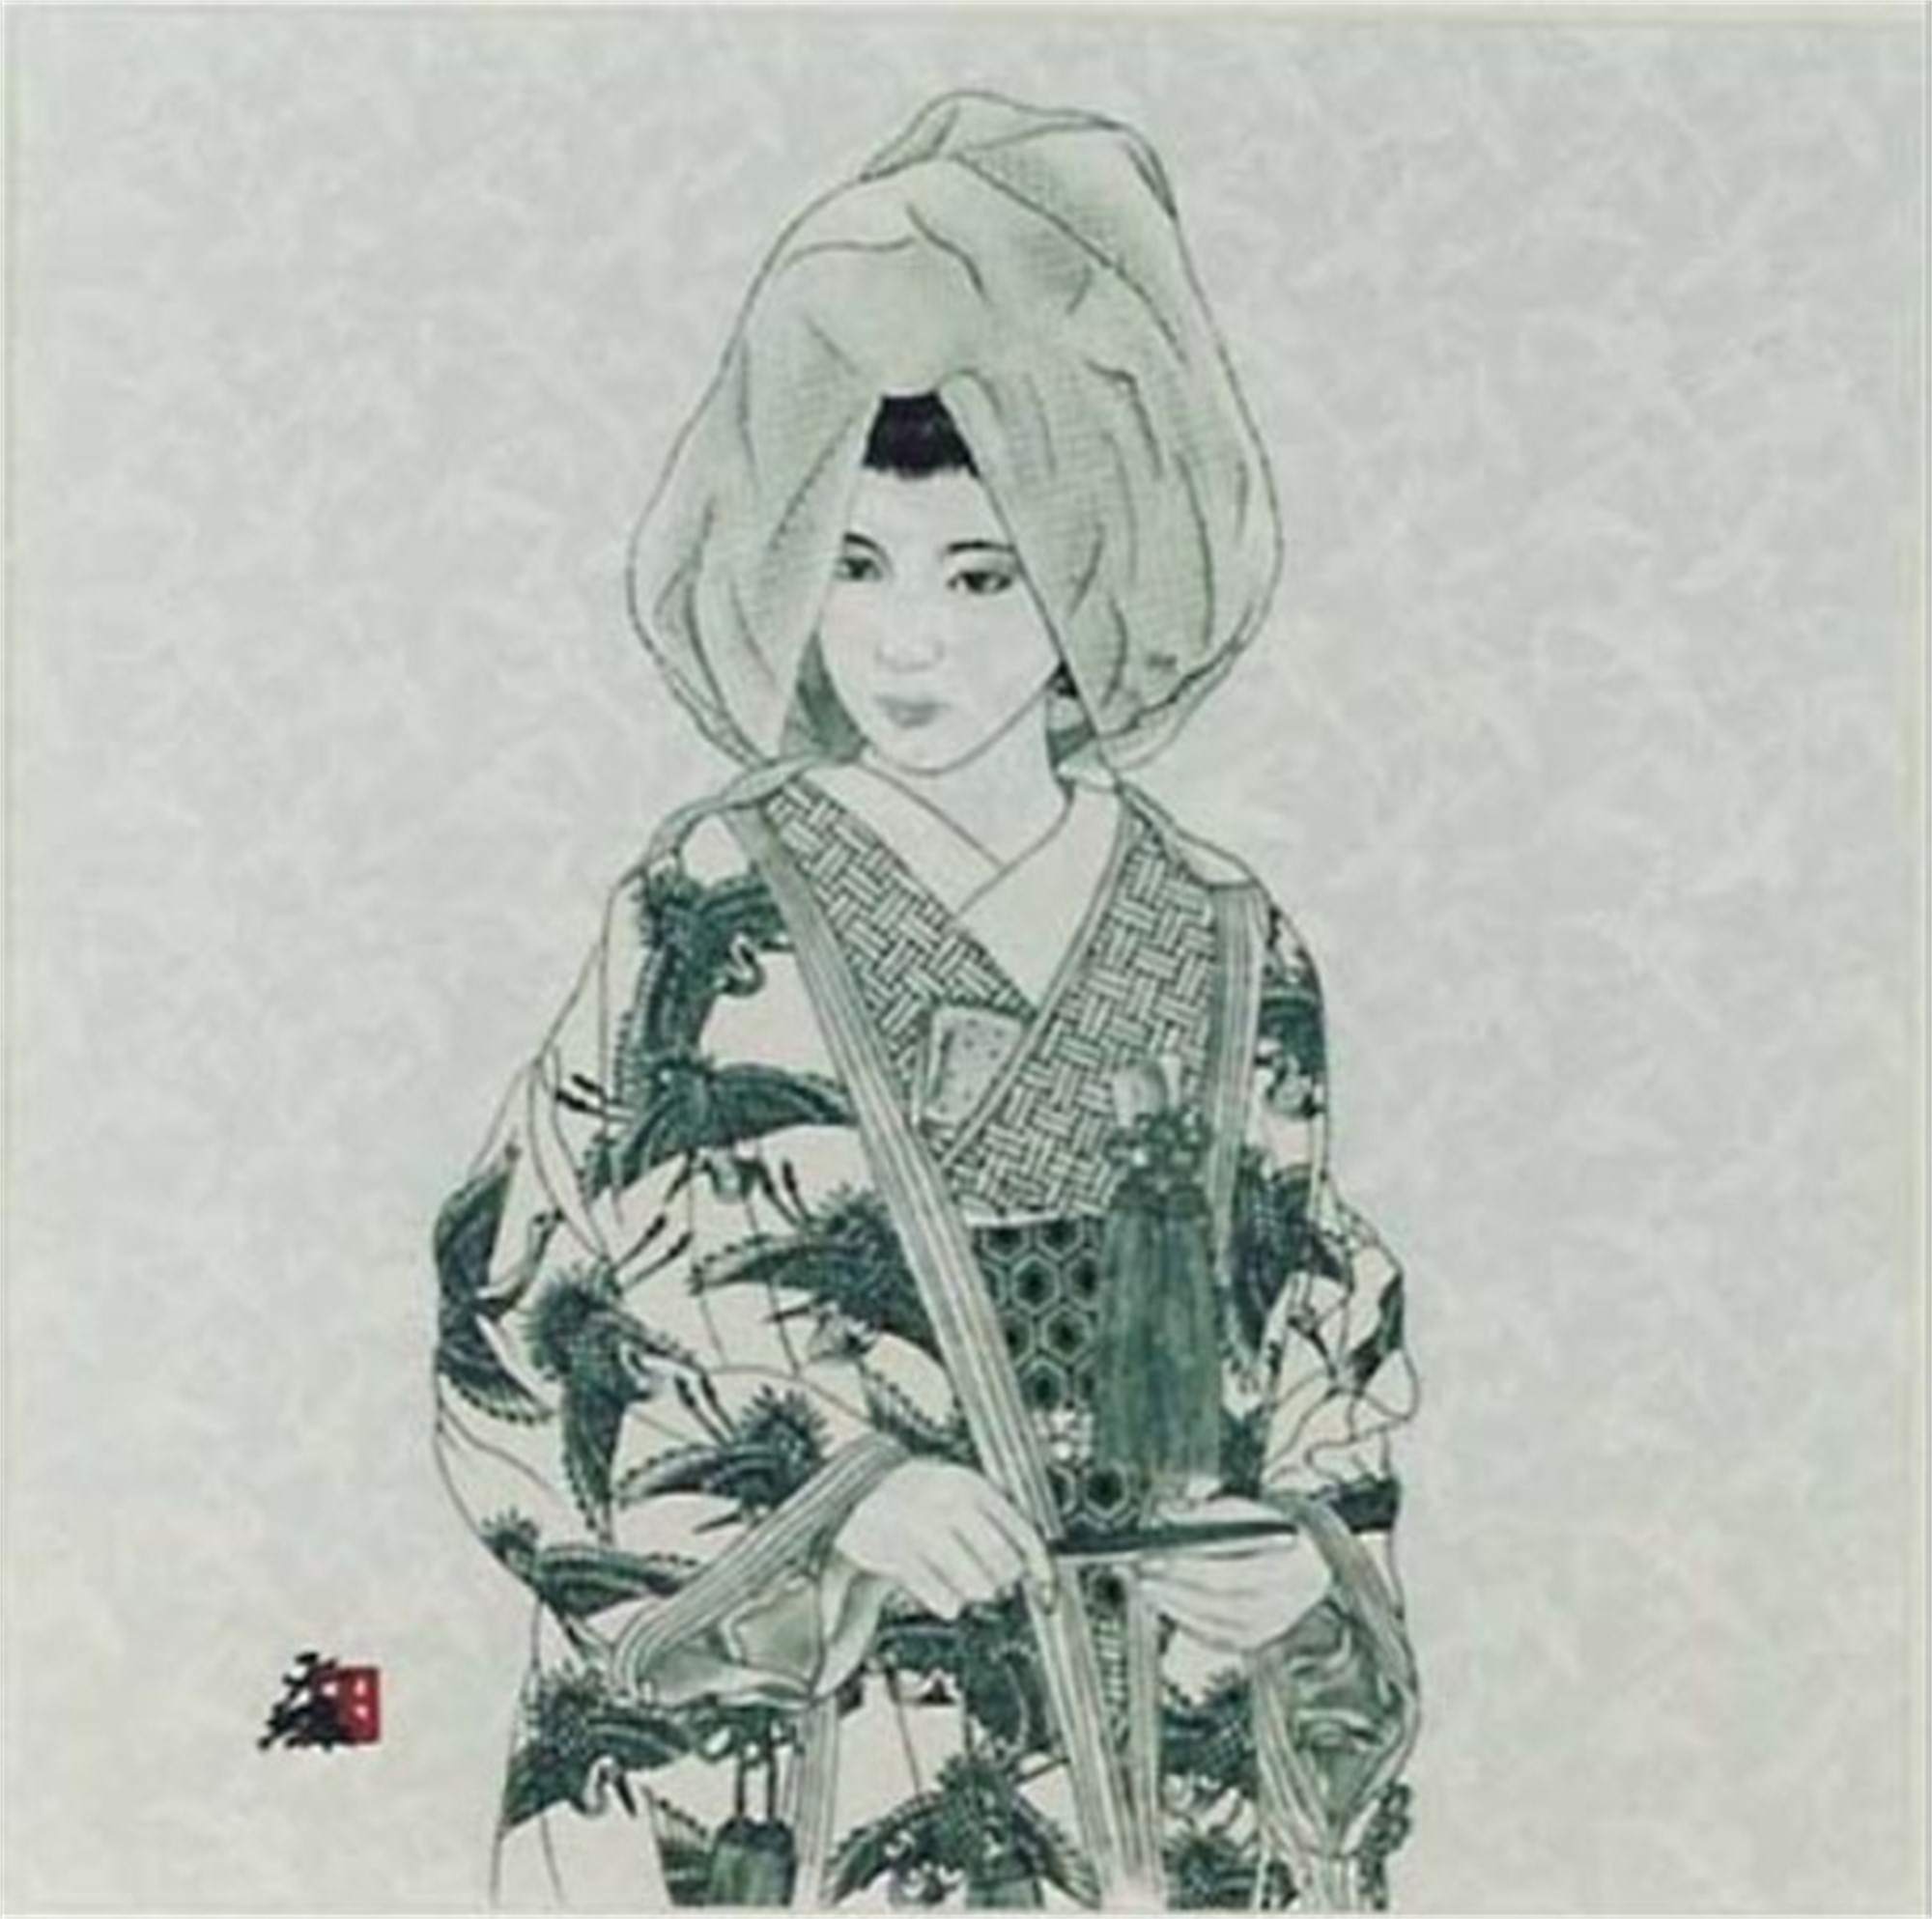 B/W Bride Of Perfection by Hisashi Otsuka